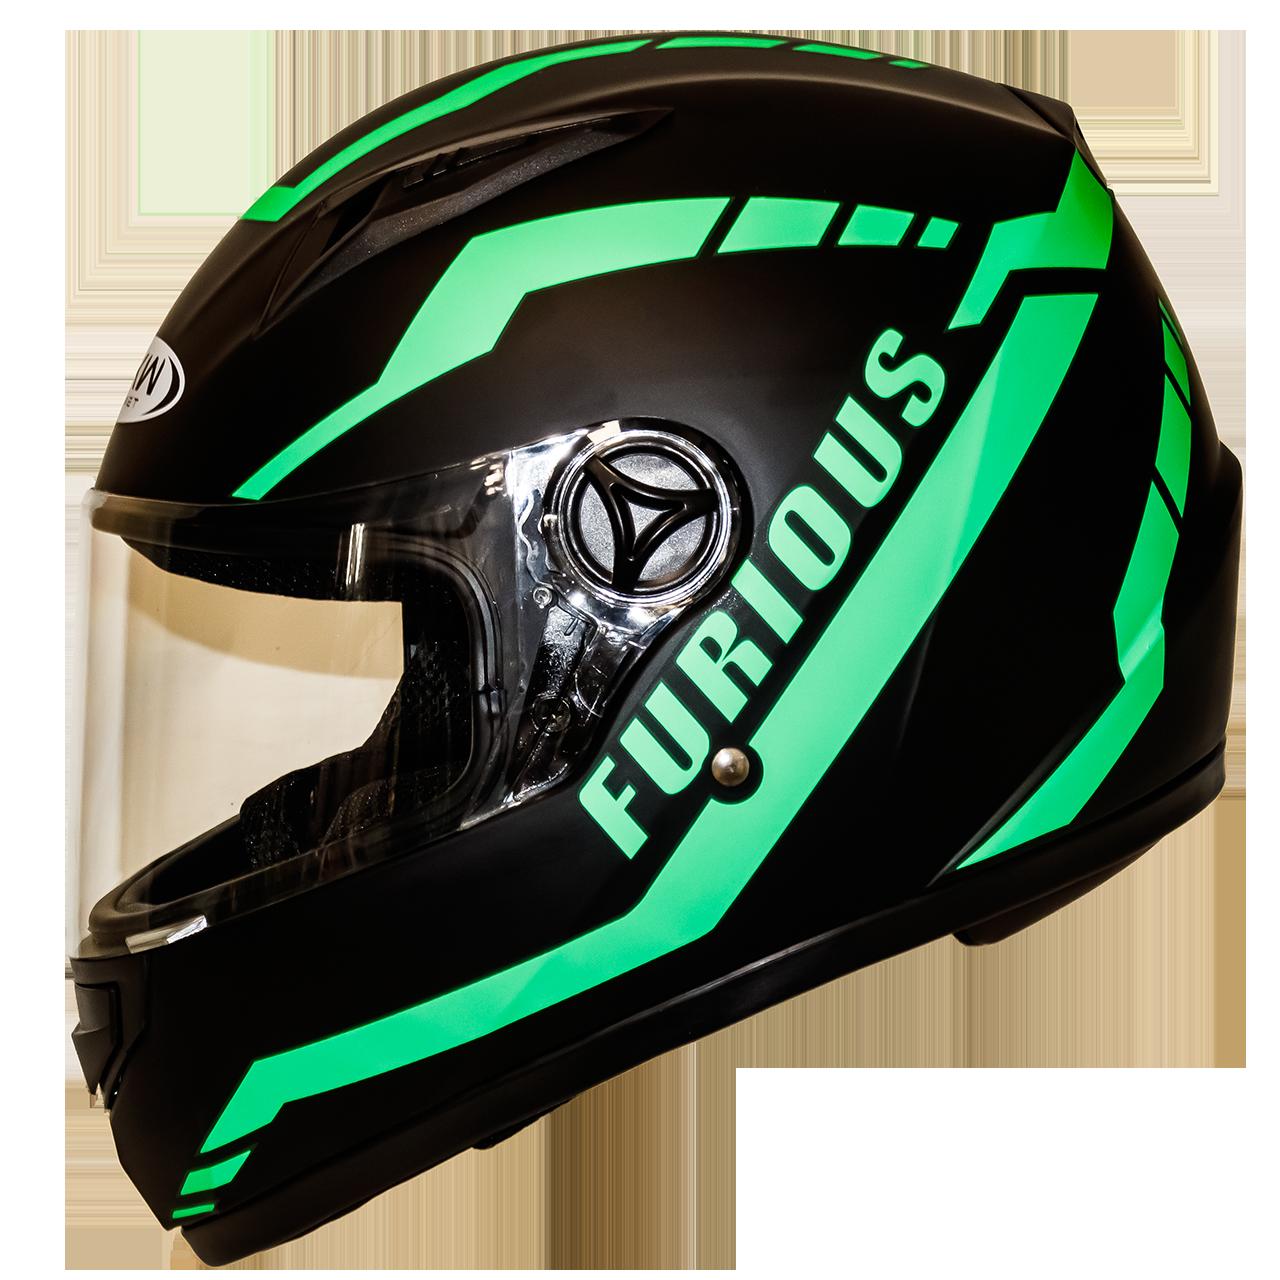 Мотошлем FXW HF-111 matte black-green закрытый шлем интеграл, full-face матовый чёрный